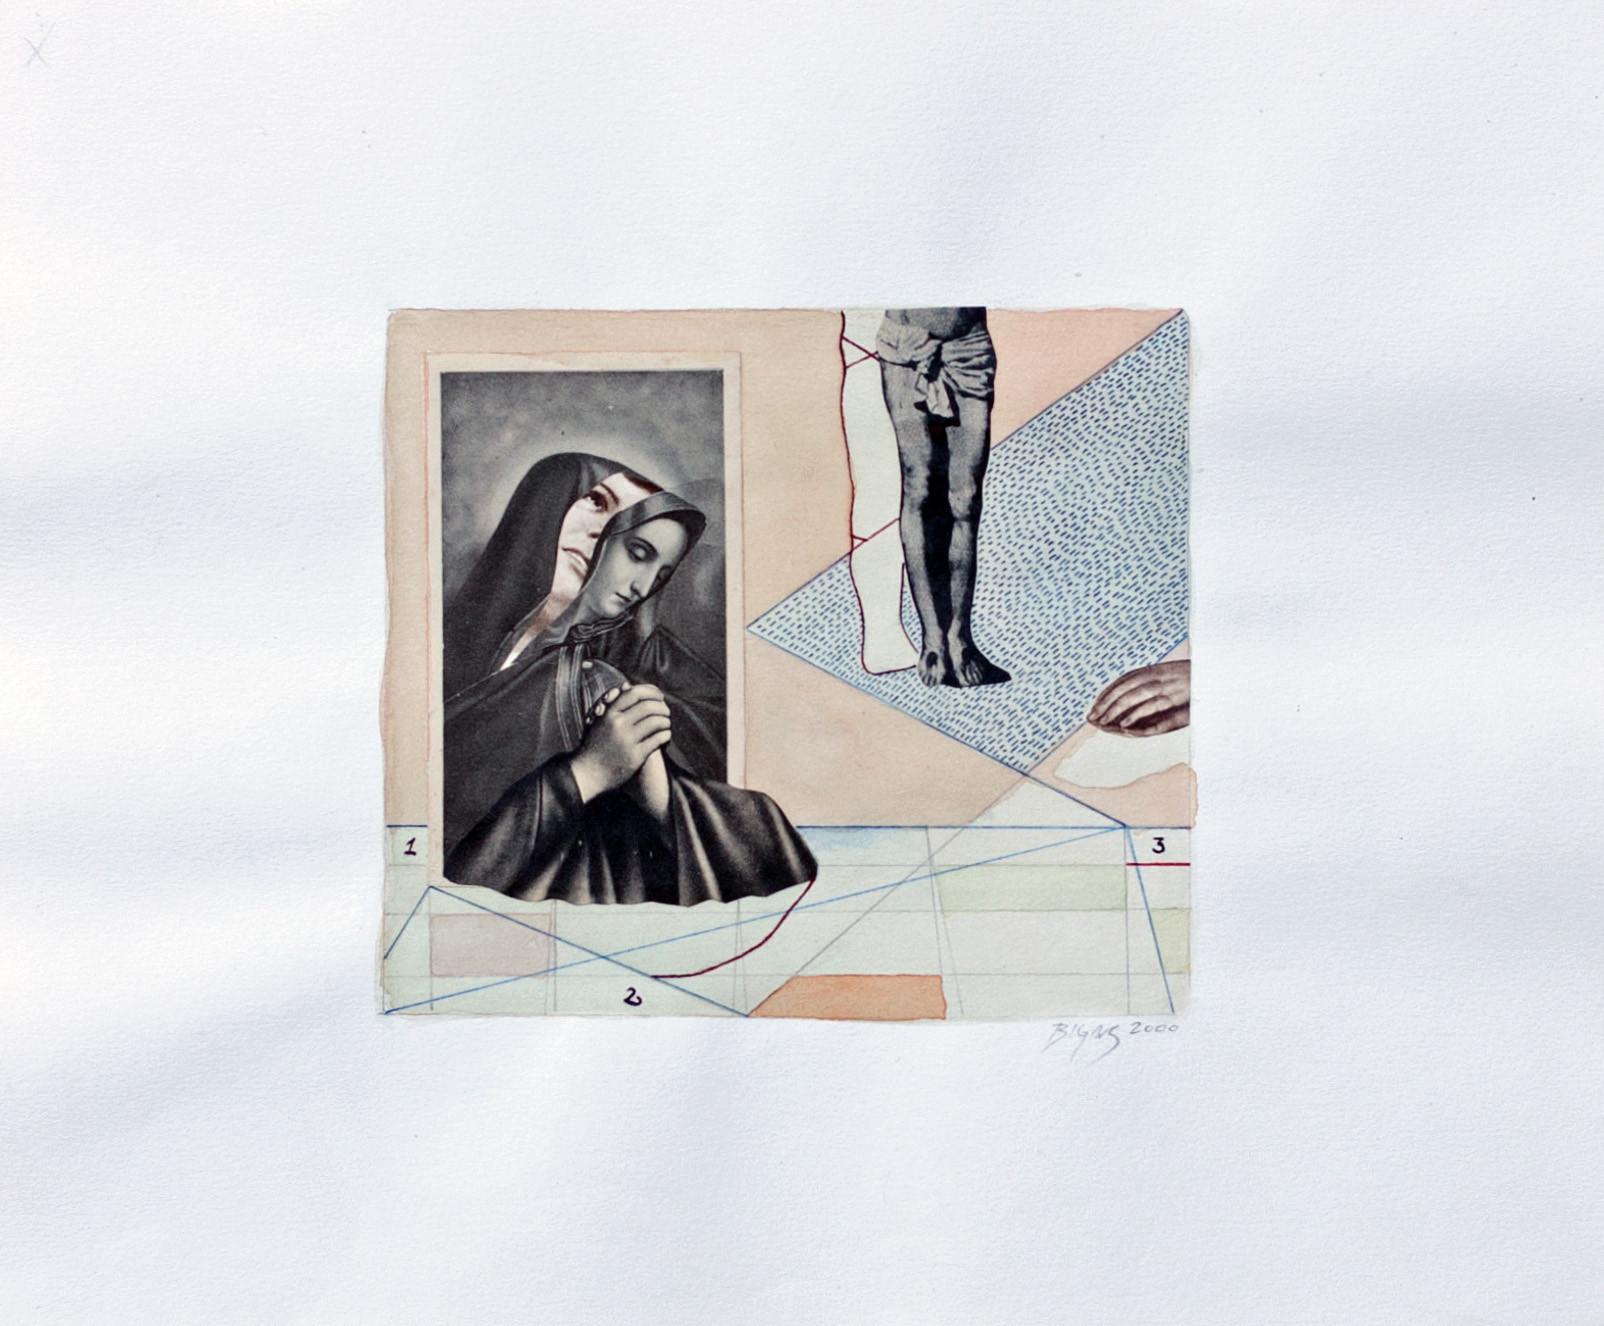 Penitencia 2000 28'5x24cm Collage and watercolour on paper